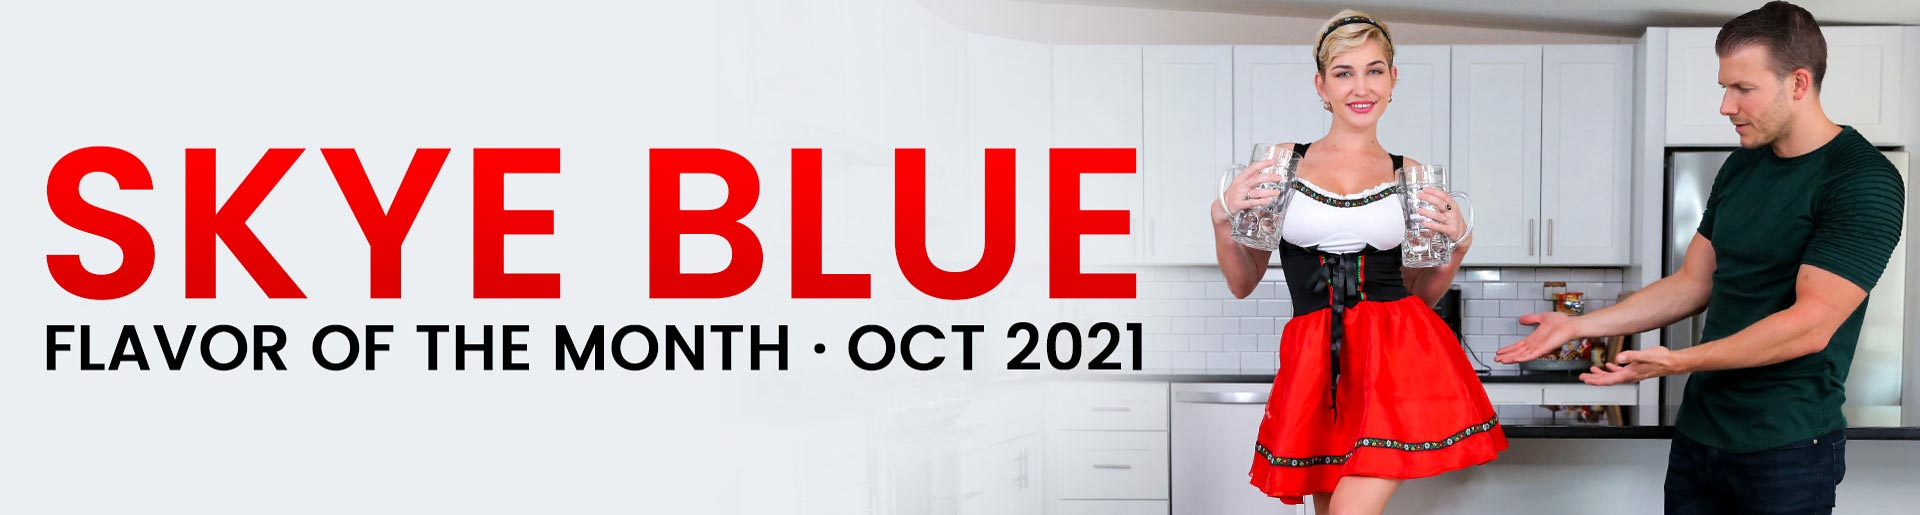 Flavor of the month Skye Blue October 2021